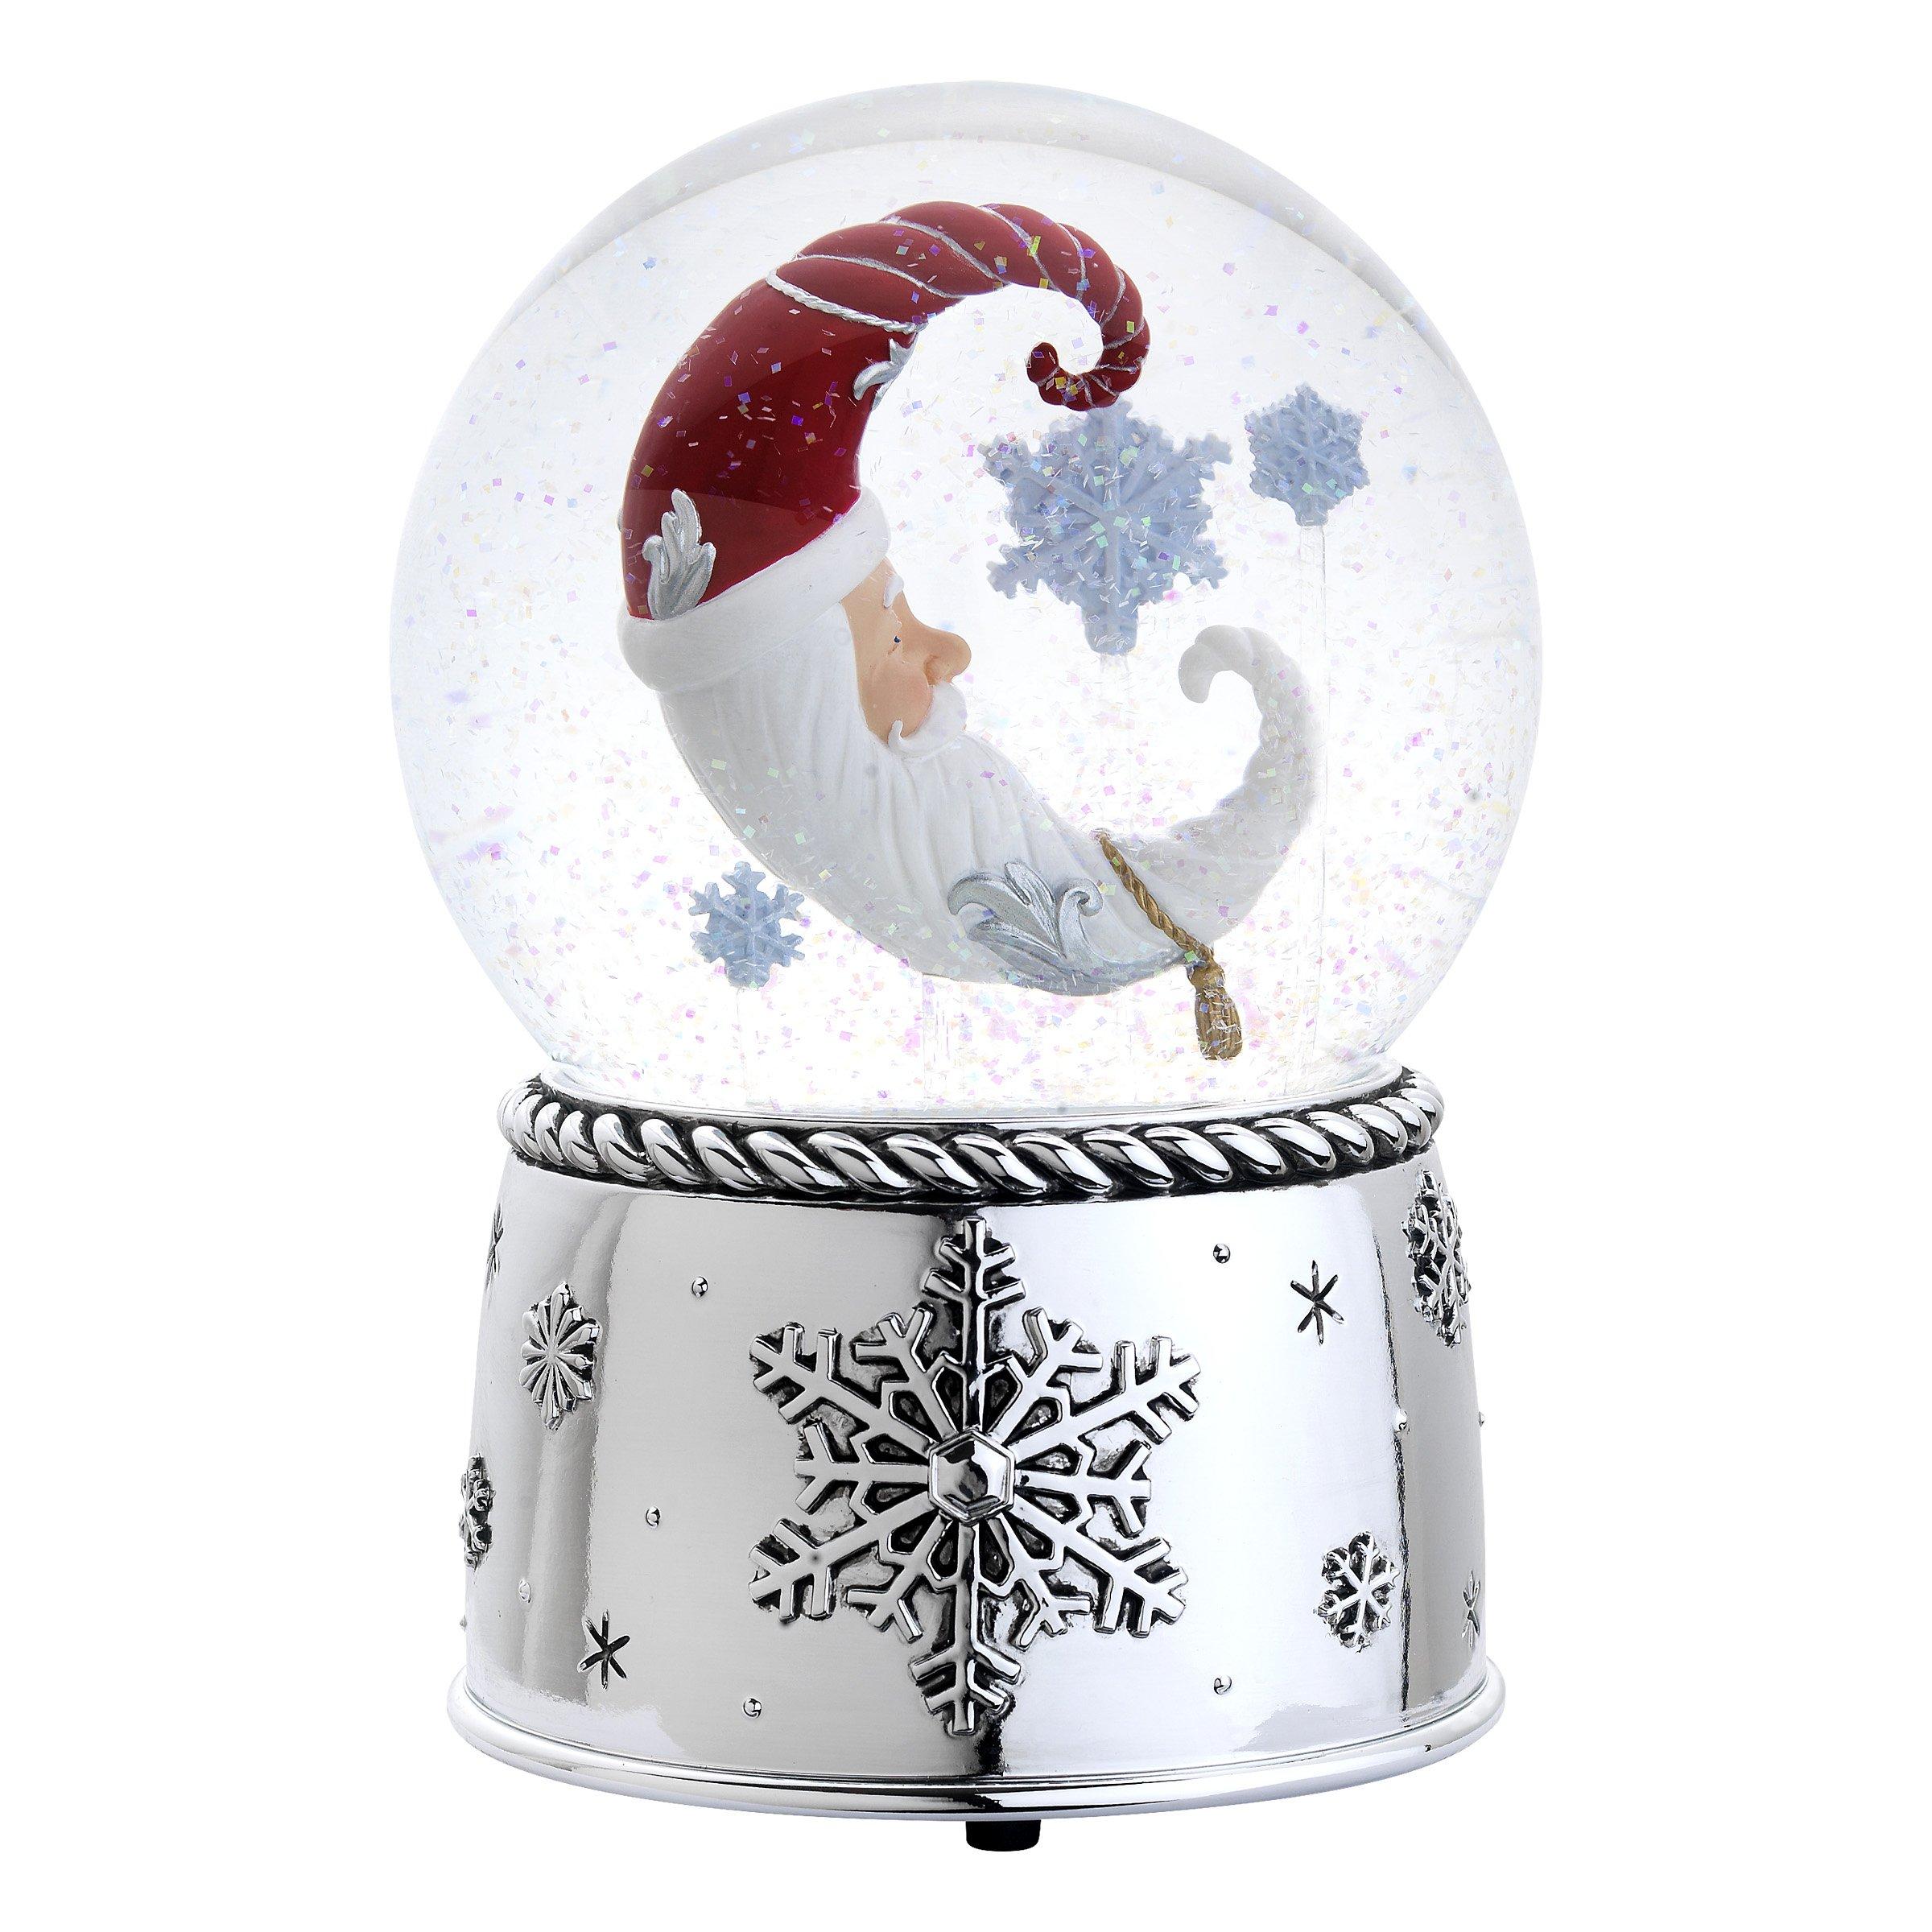 Reed & Barton 4315 Winter Dreams Snow Globe, 6.75-Inch, Plays Greensleeves by Reed & Barton (Image #1)